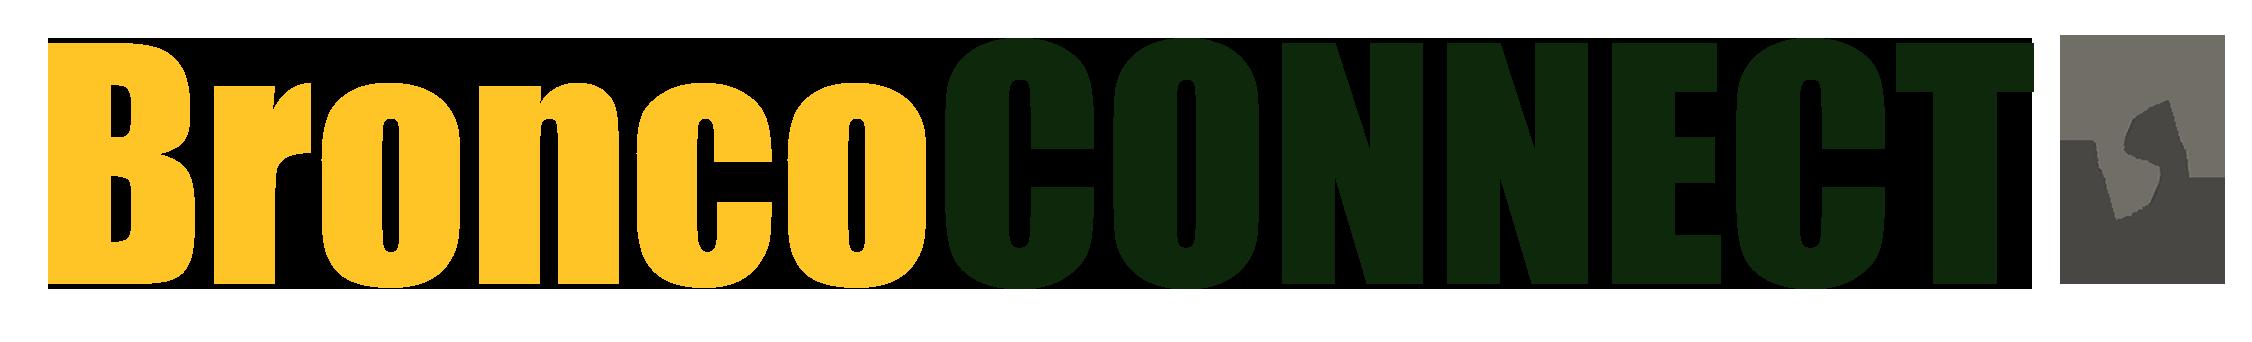 BroncoConnect Student Portal